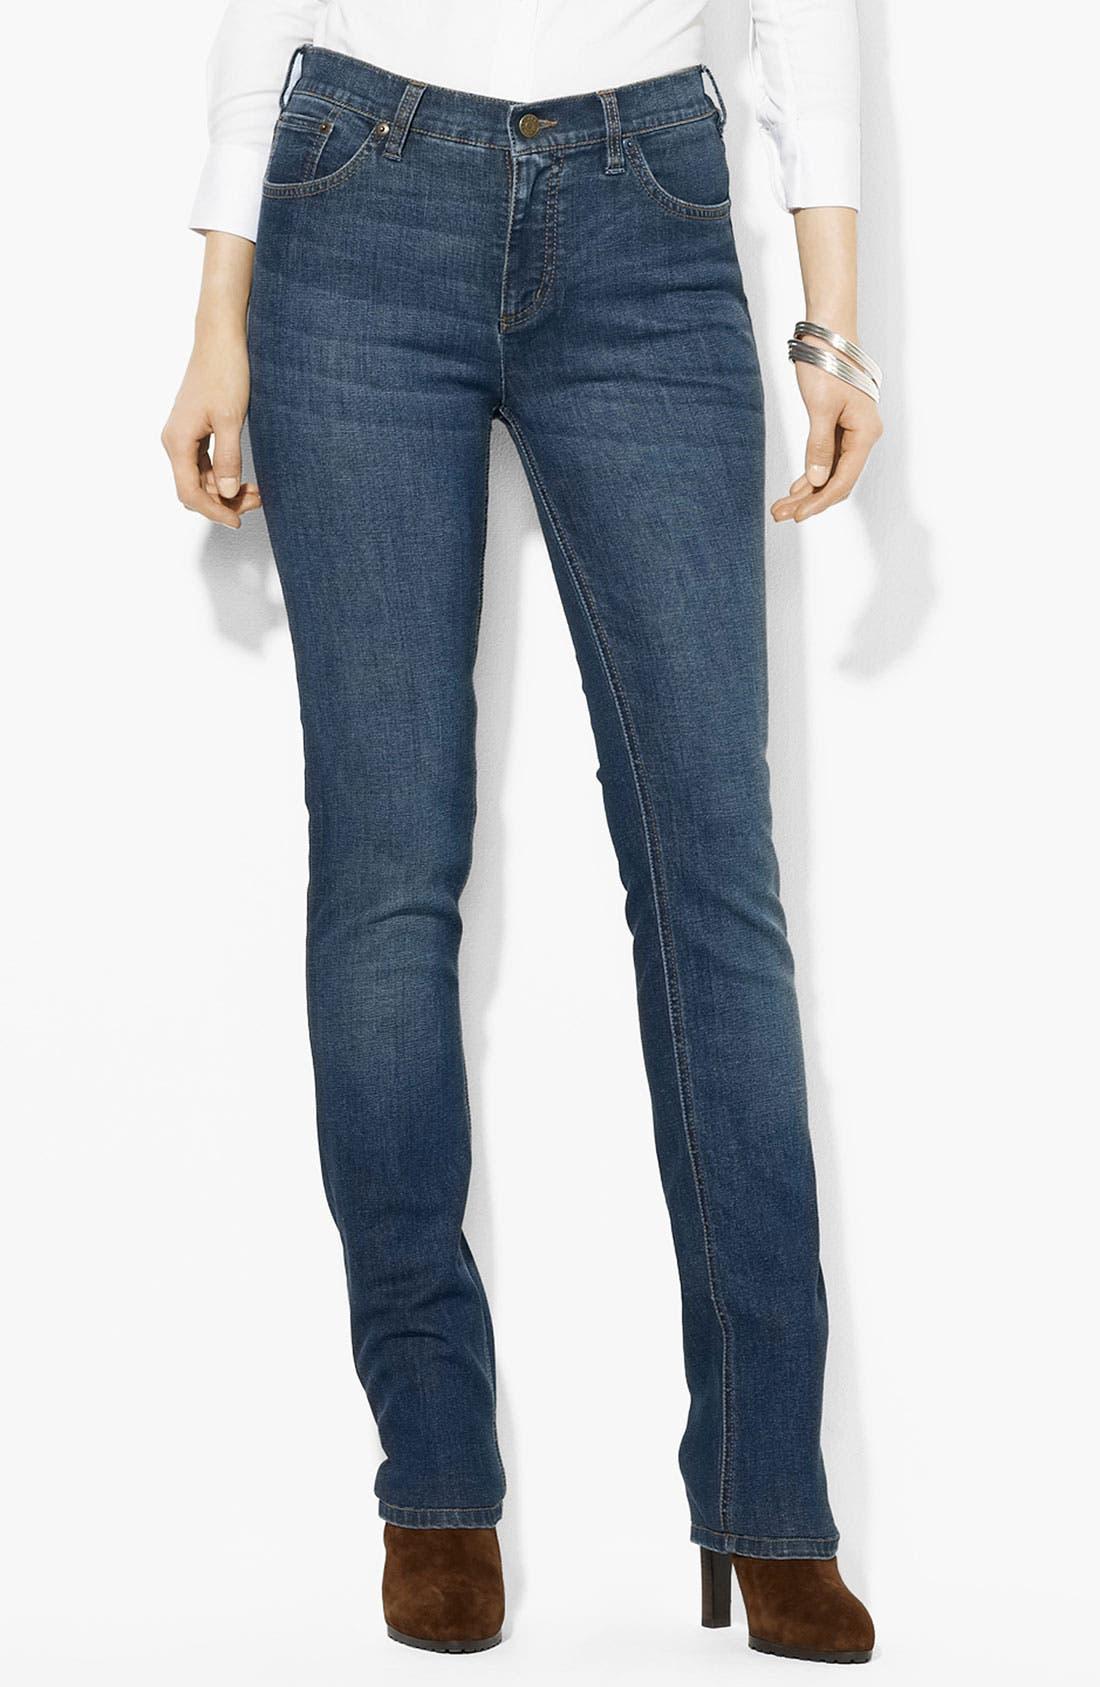 Alternate Image 1 Selected - Lauren Ralph Lauren Slimming Straight Leg Jeans (Petite) (Online Only)